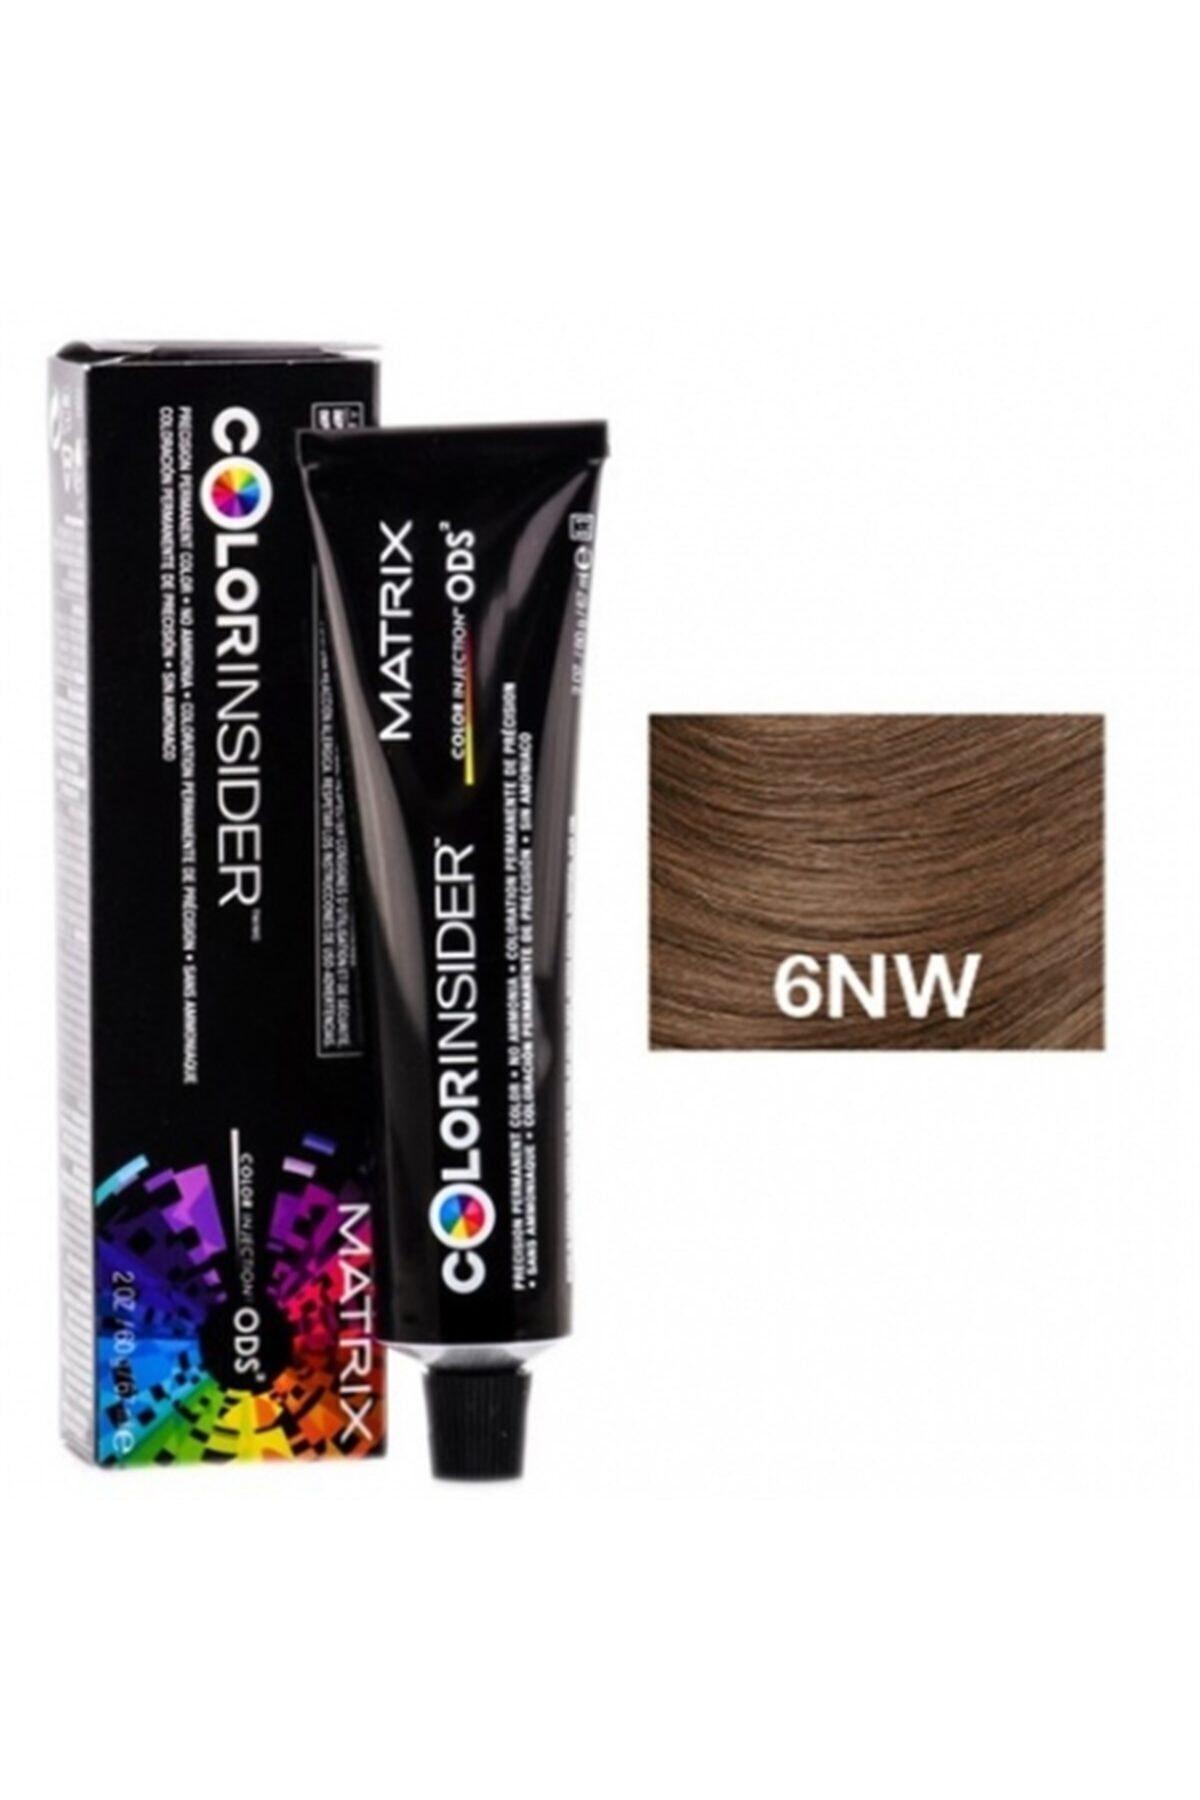 Matrix Color Insider Saç Boyası 6nw/6,03-dark Blonde Neutral 1